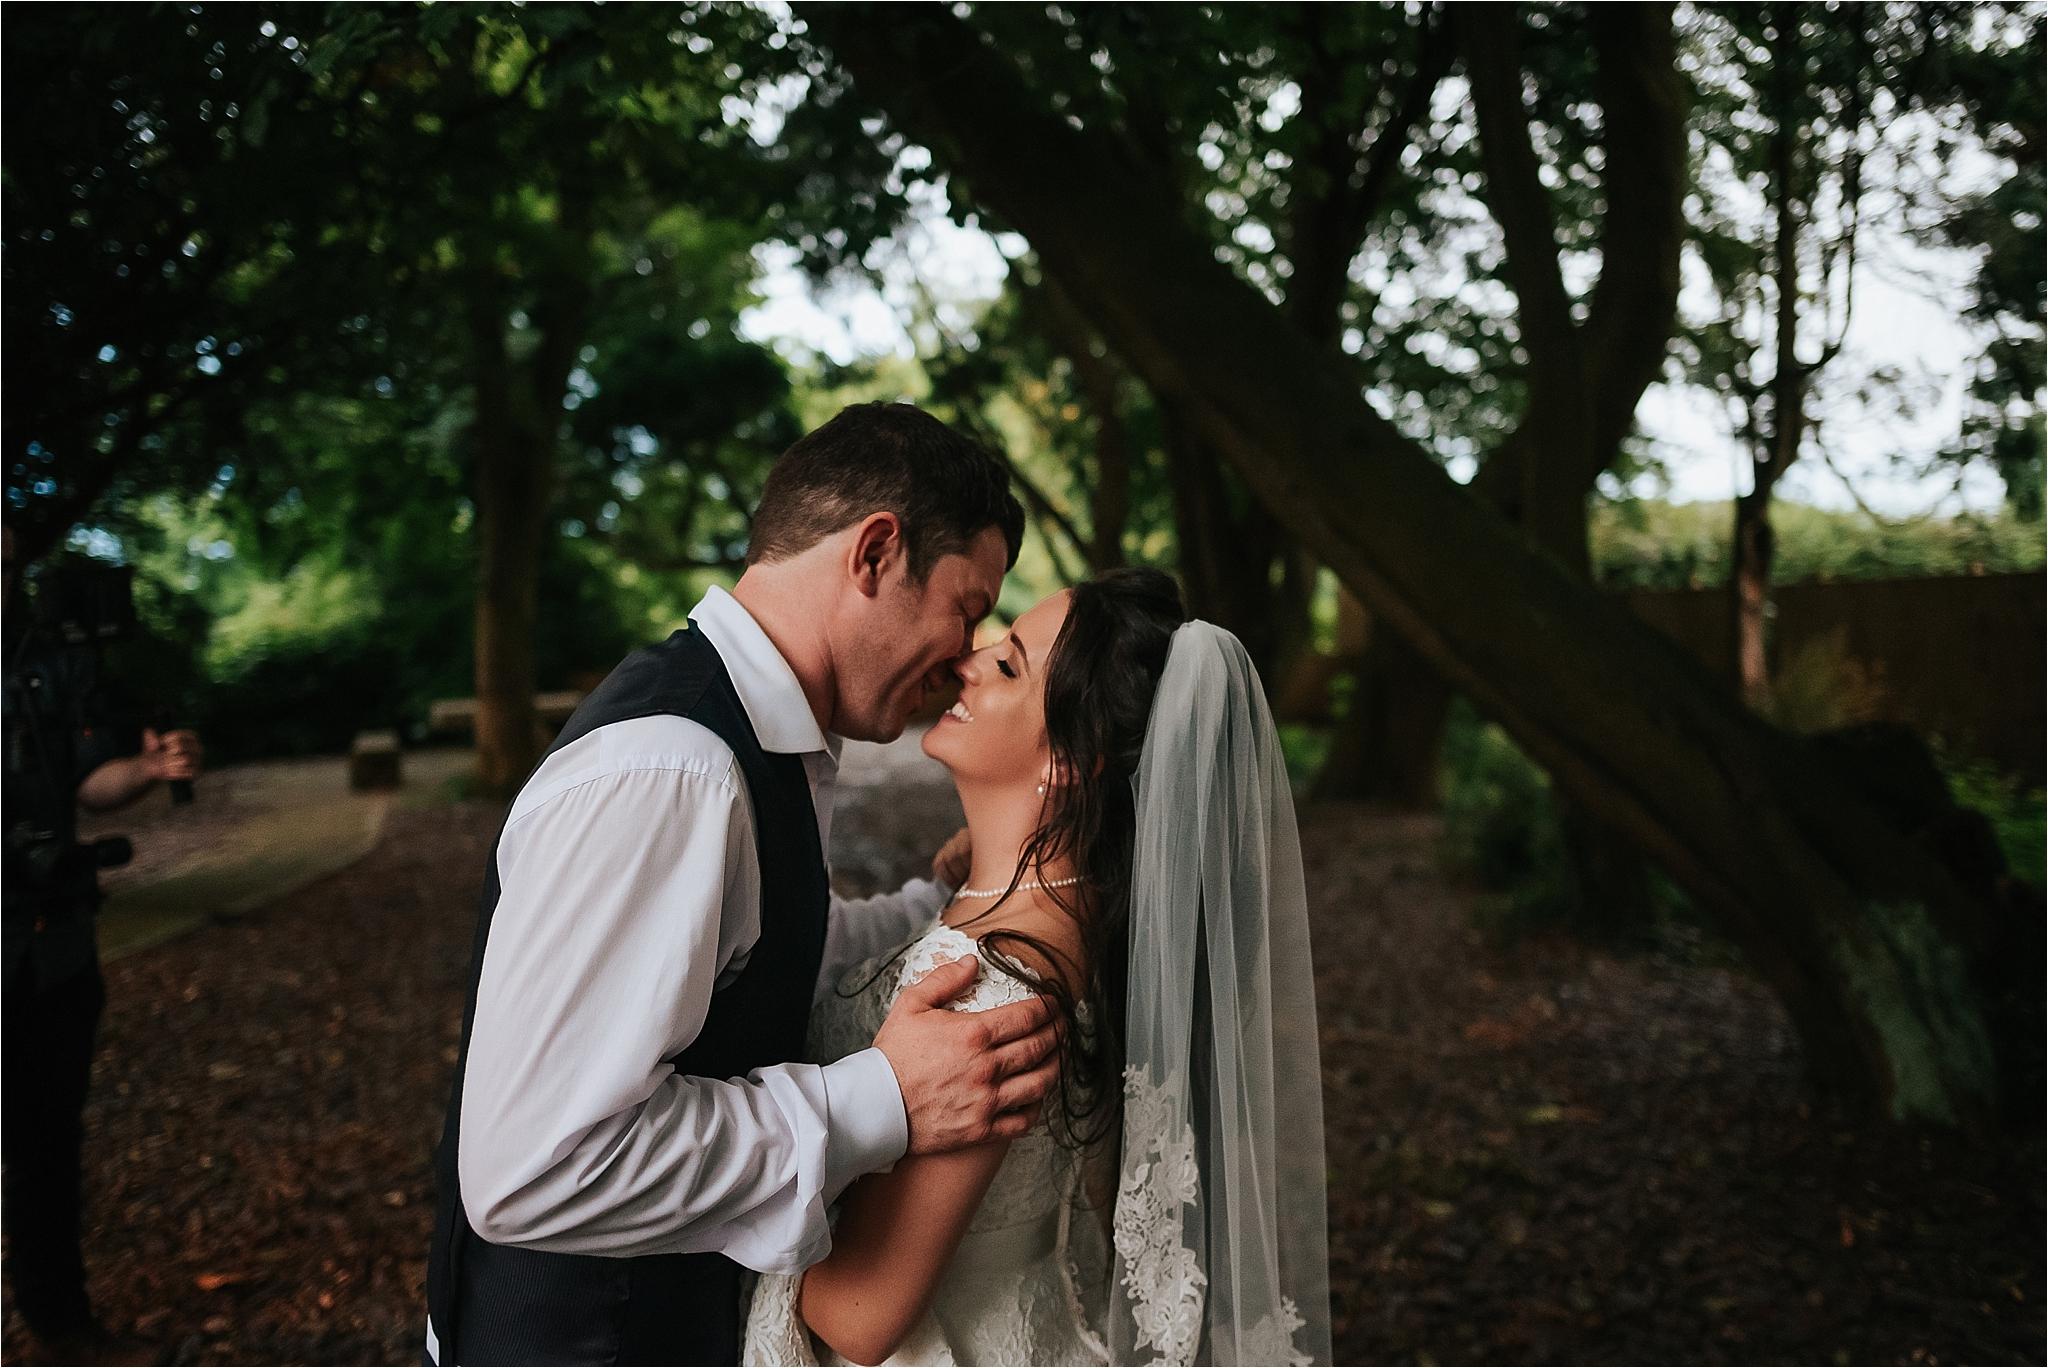 thevilla+lancashire+wreagreen+wedding+photographer109.jpg